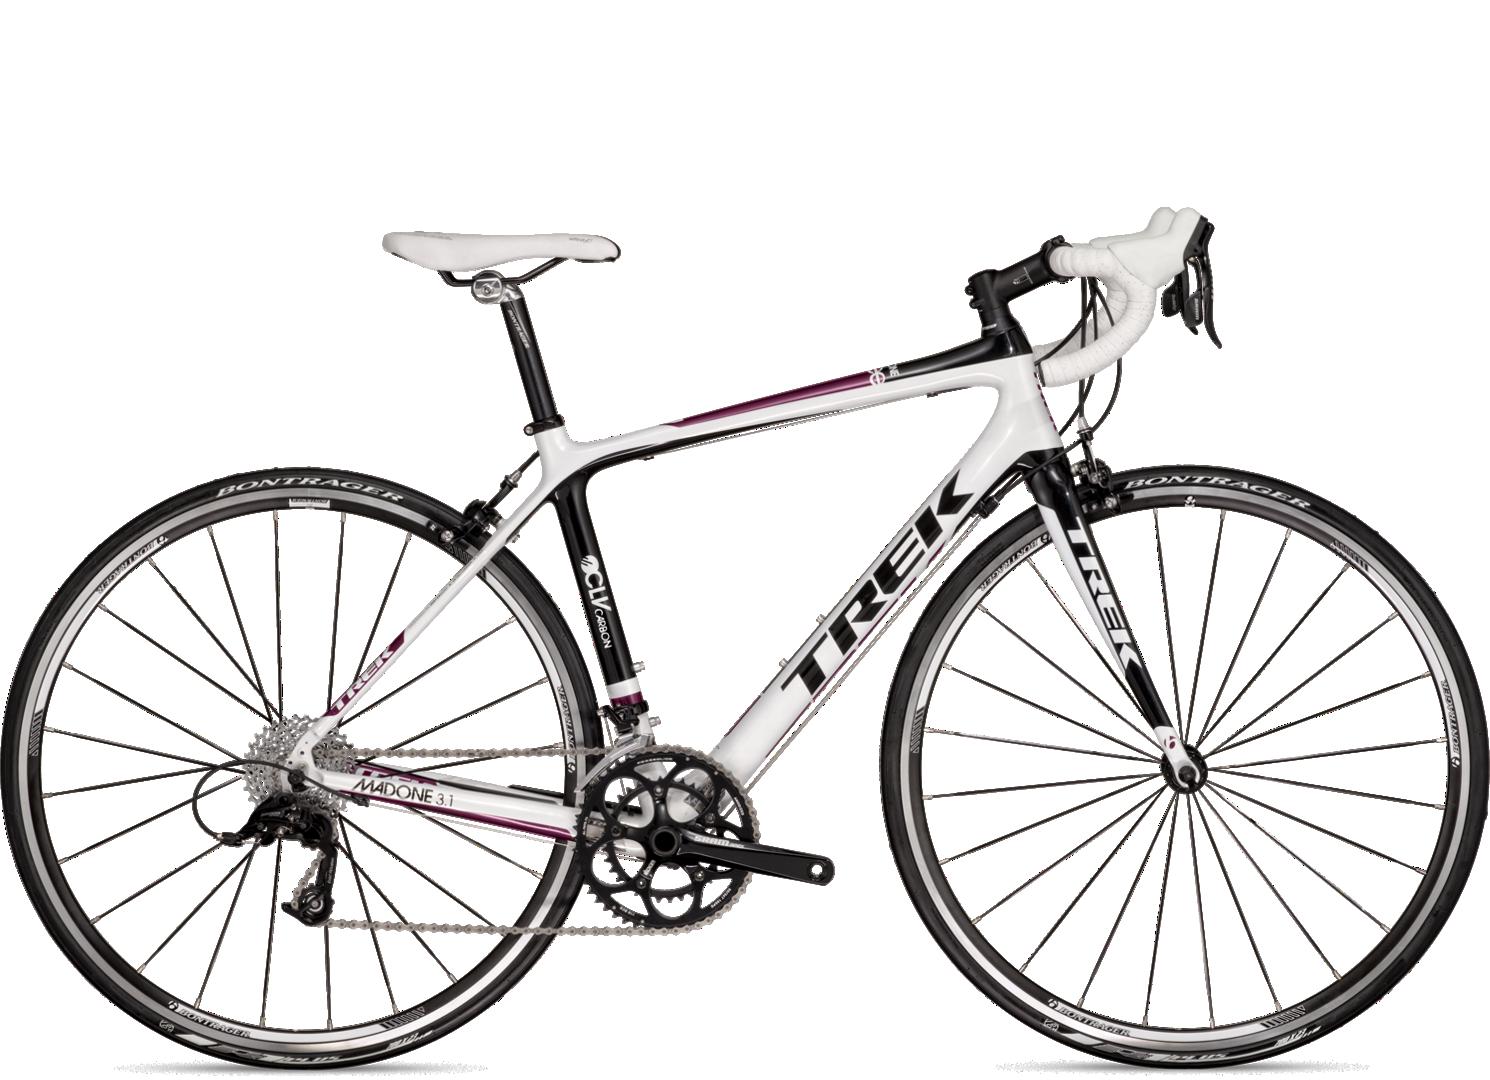 Bicycle Tune Up >> 2012 Madone 3.1 WSD Apex (Compact) - Bike Archive - Trek ...